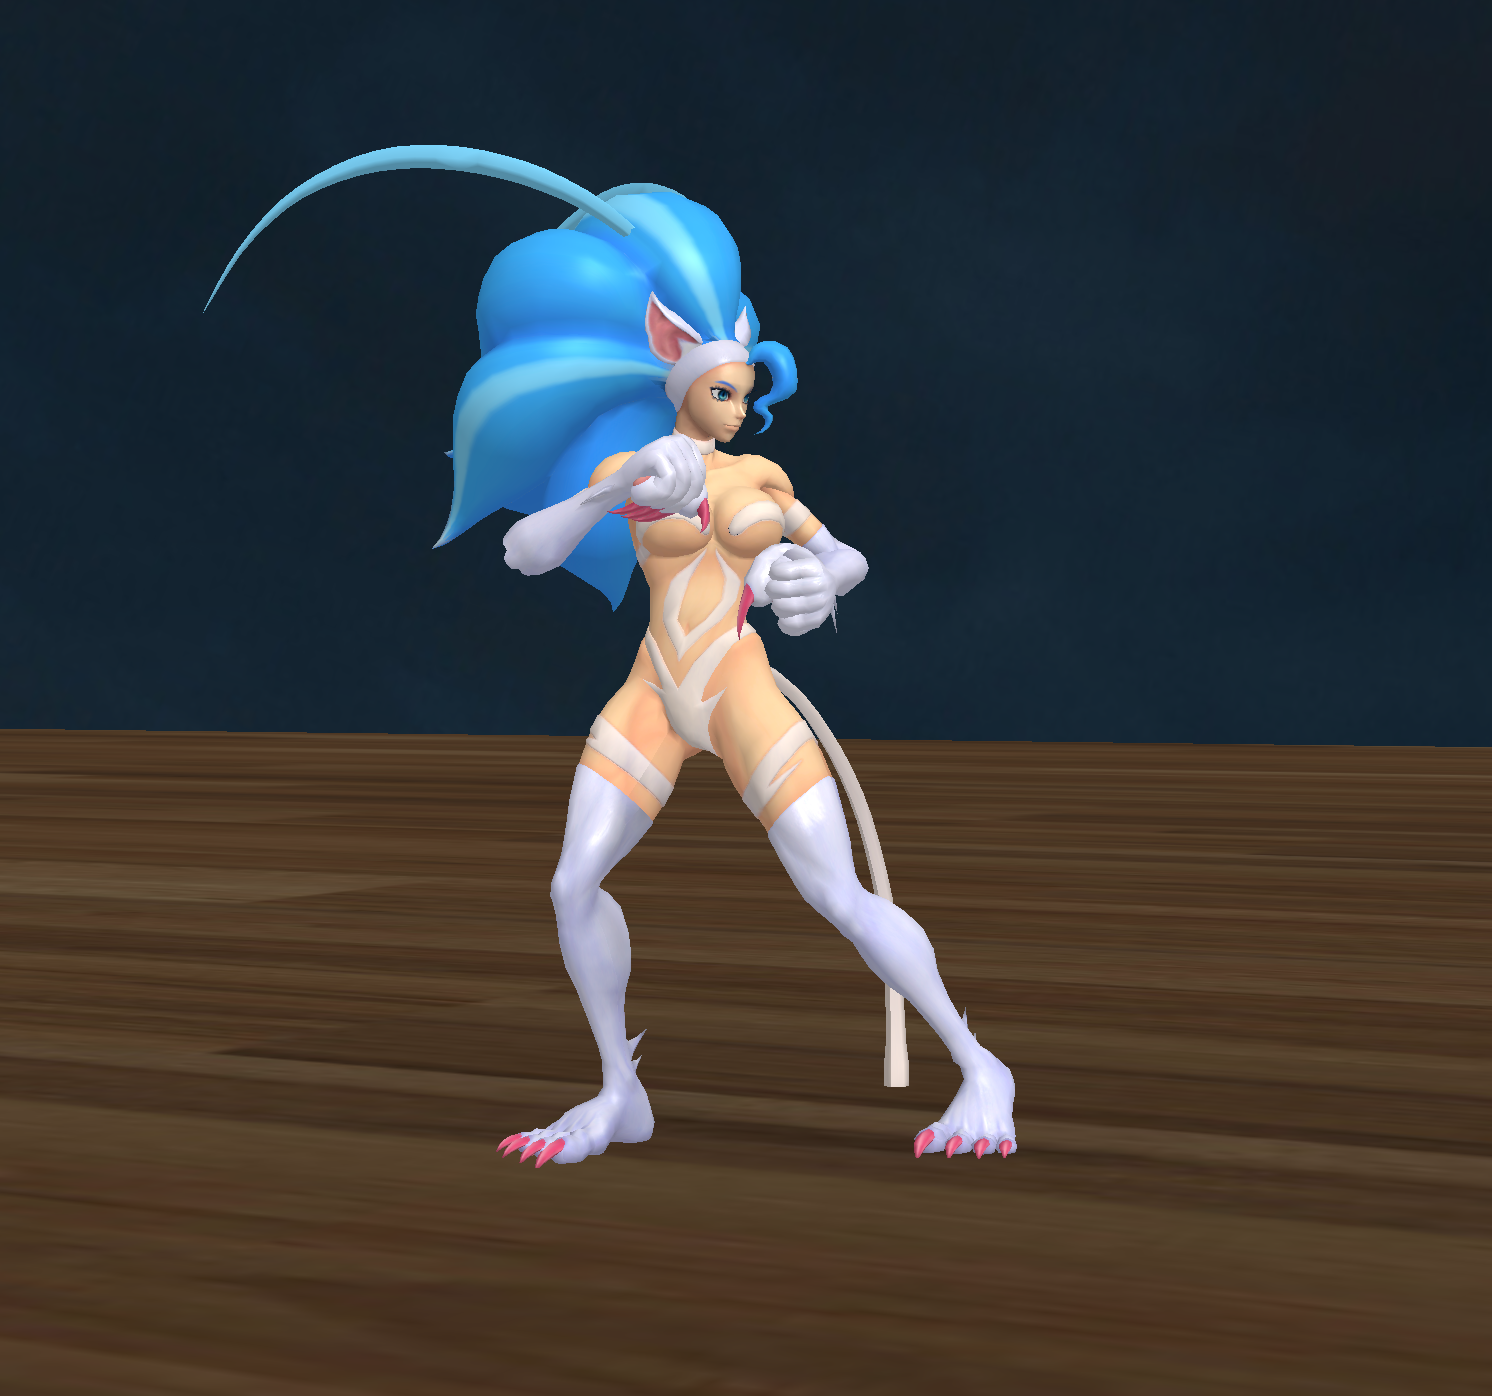 Felicia Ryu Stance by NekoHybrid